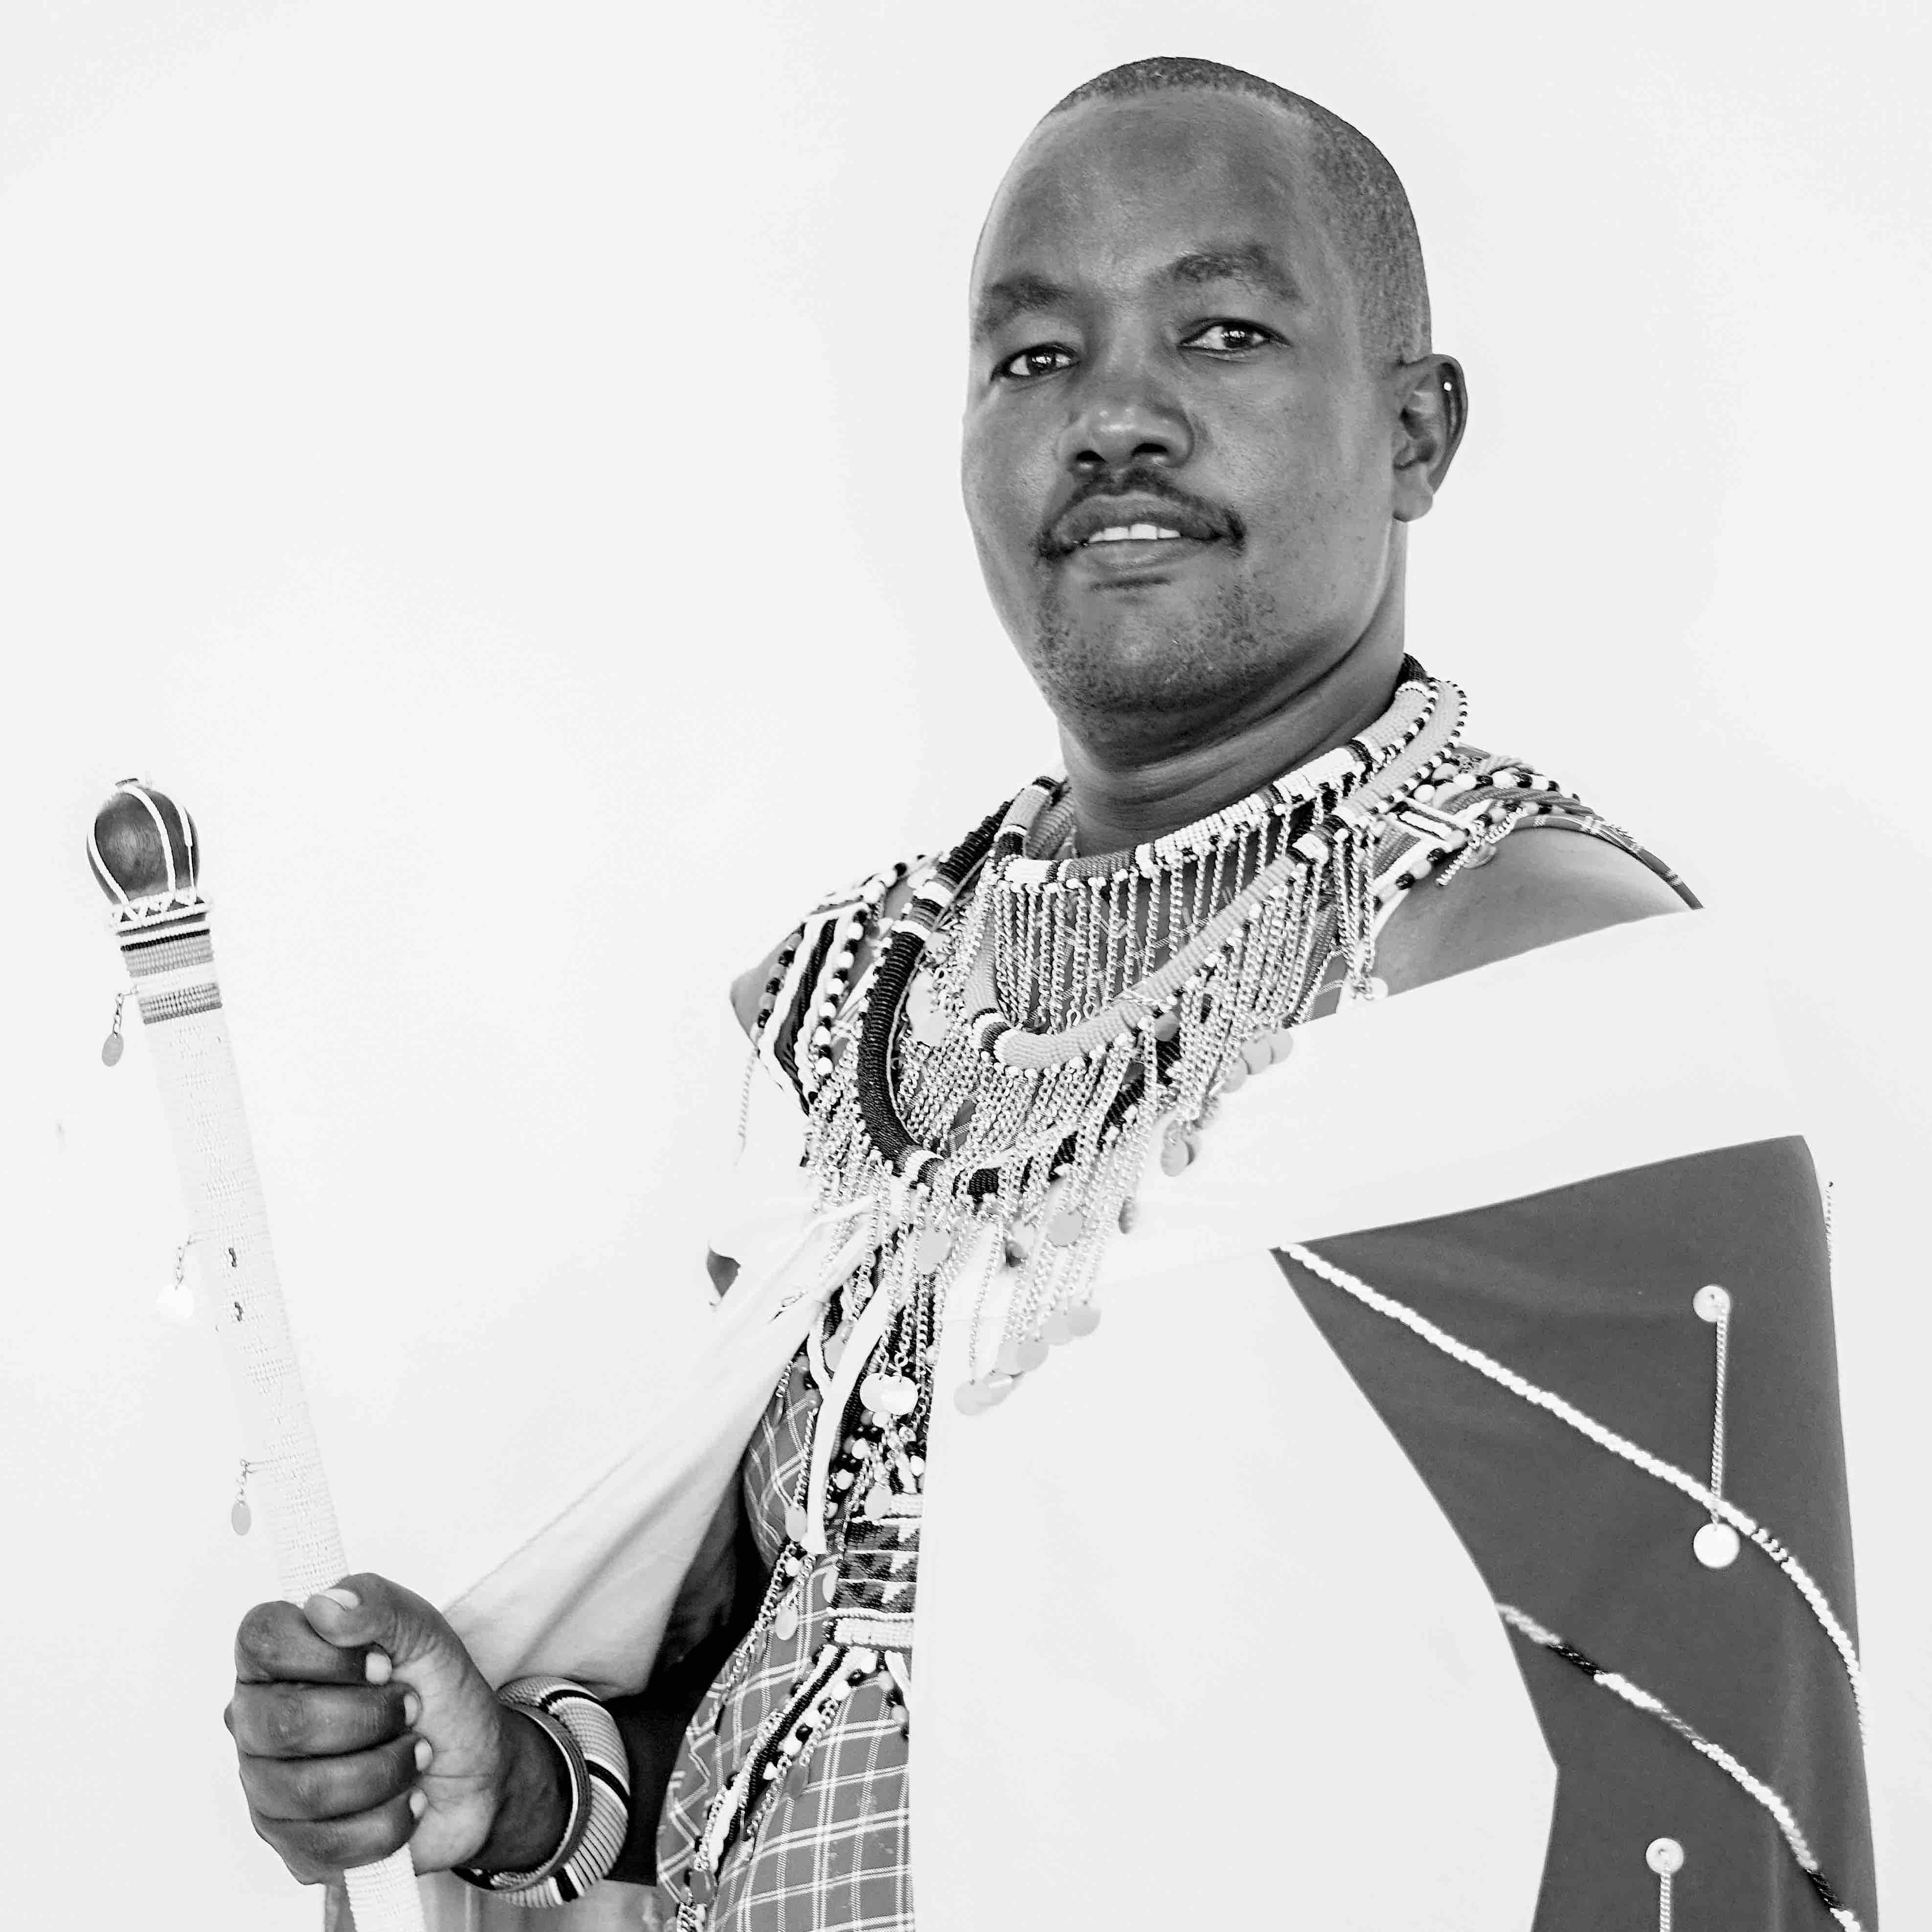 Portrait of Amos Leuka, Maasai Indigenous Activist from Kenya